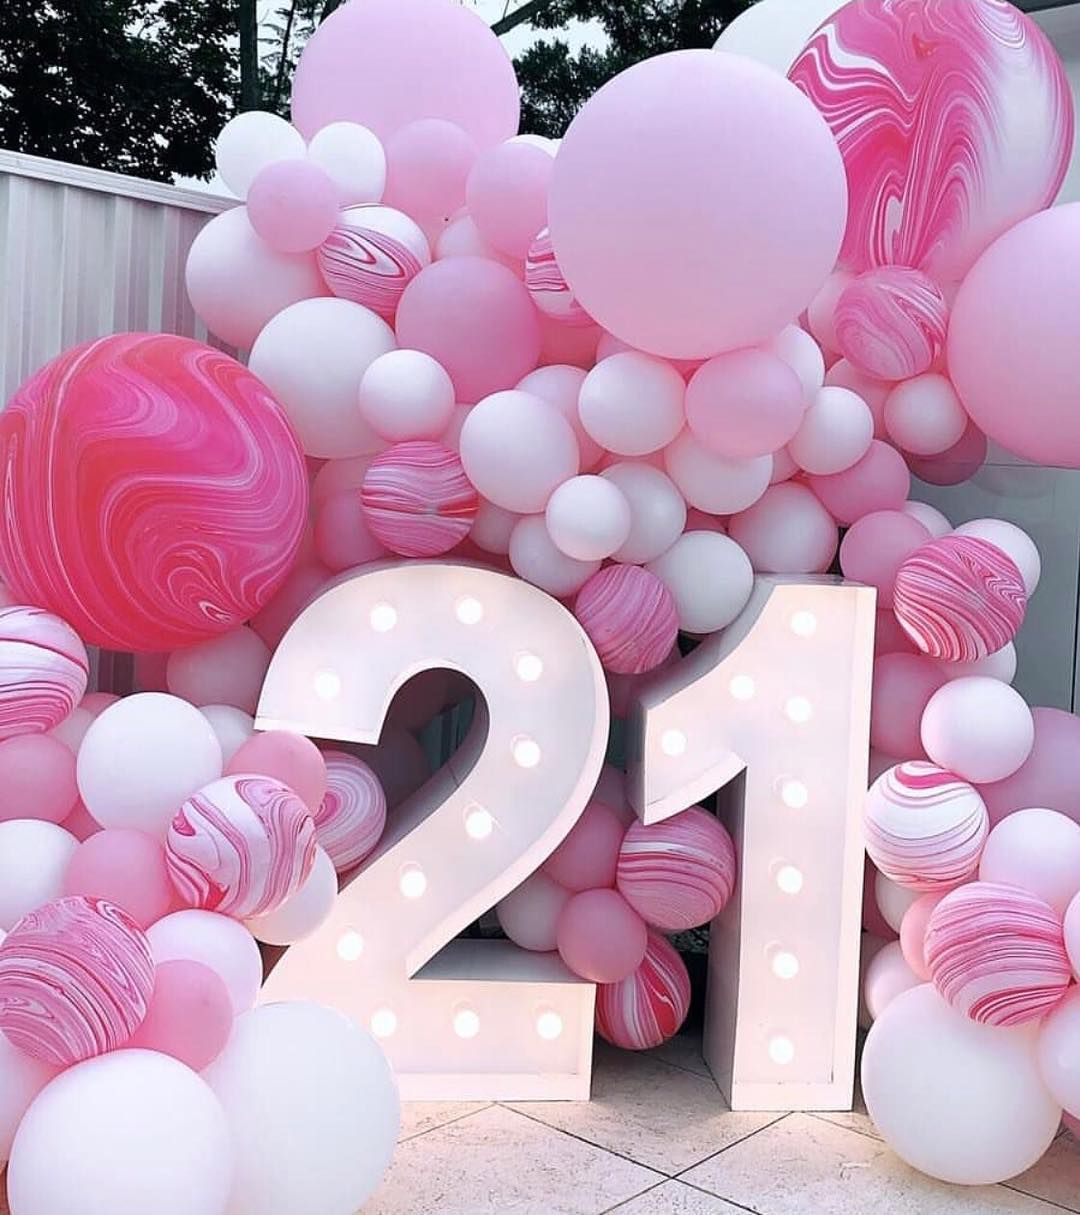 bubblemooballoons @events_florist @sweetheavenlyeventshire @limelightletters @angusporterphotography… #21stbirthdaydecorations